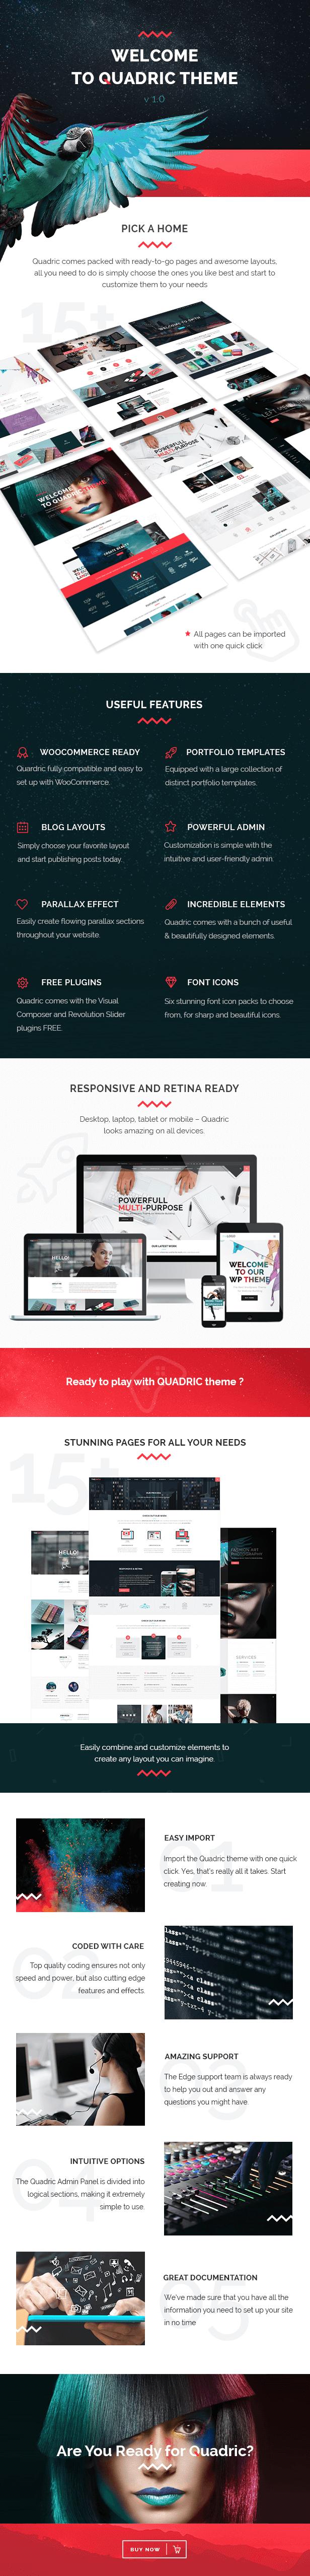 Quadric - Modern Creative Agency Theme - 1